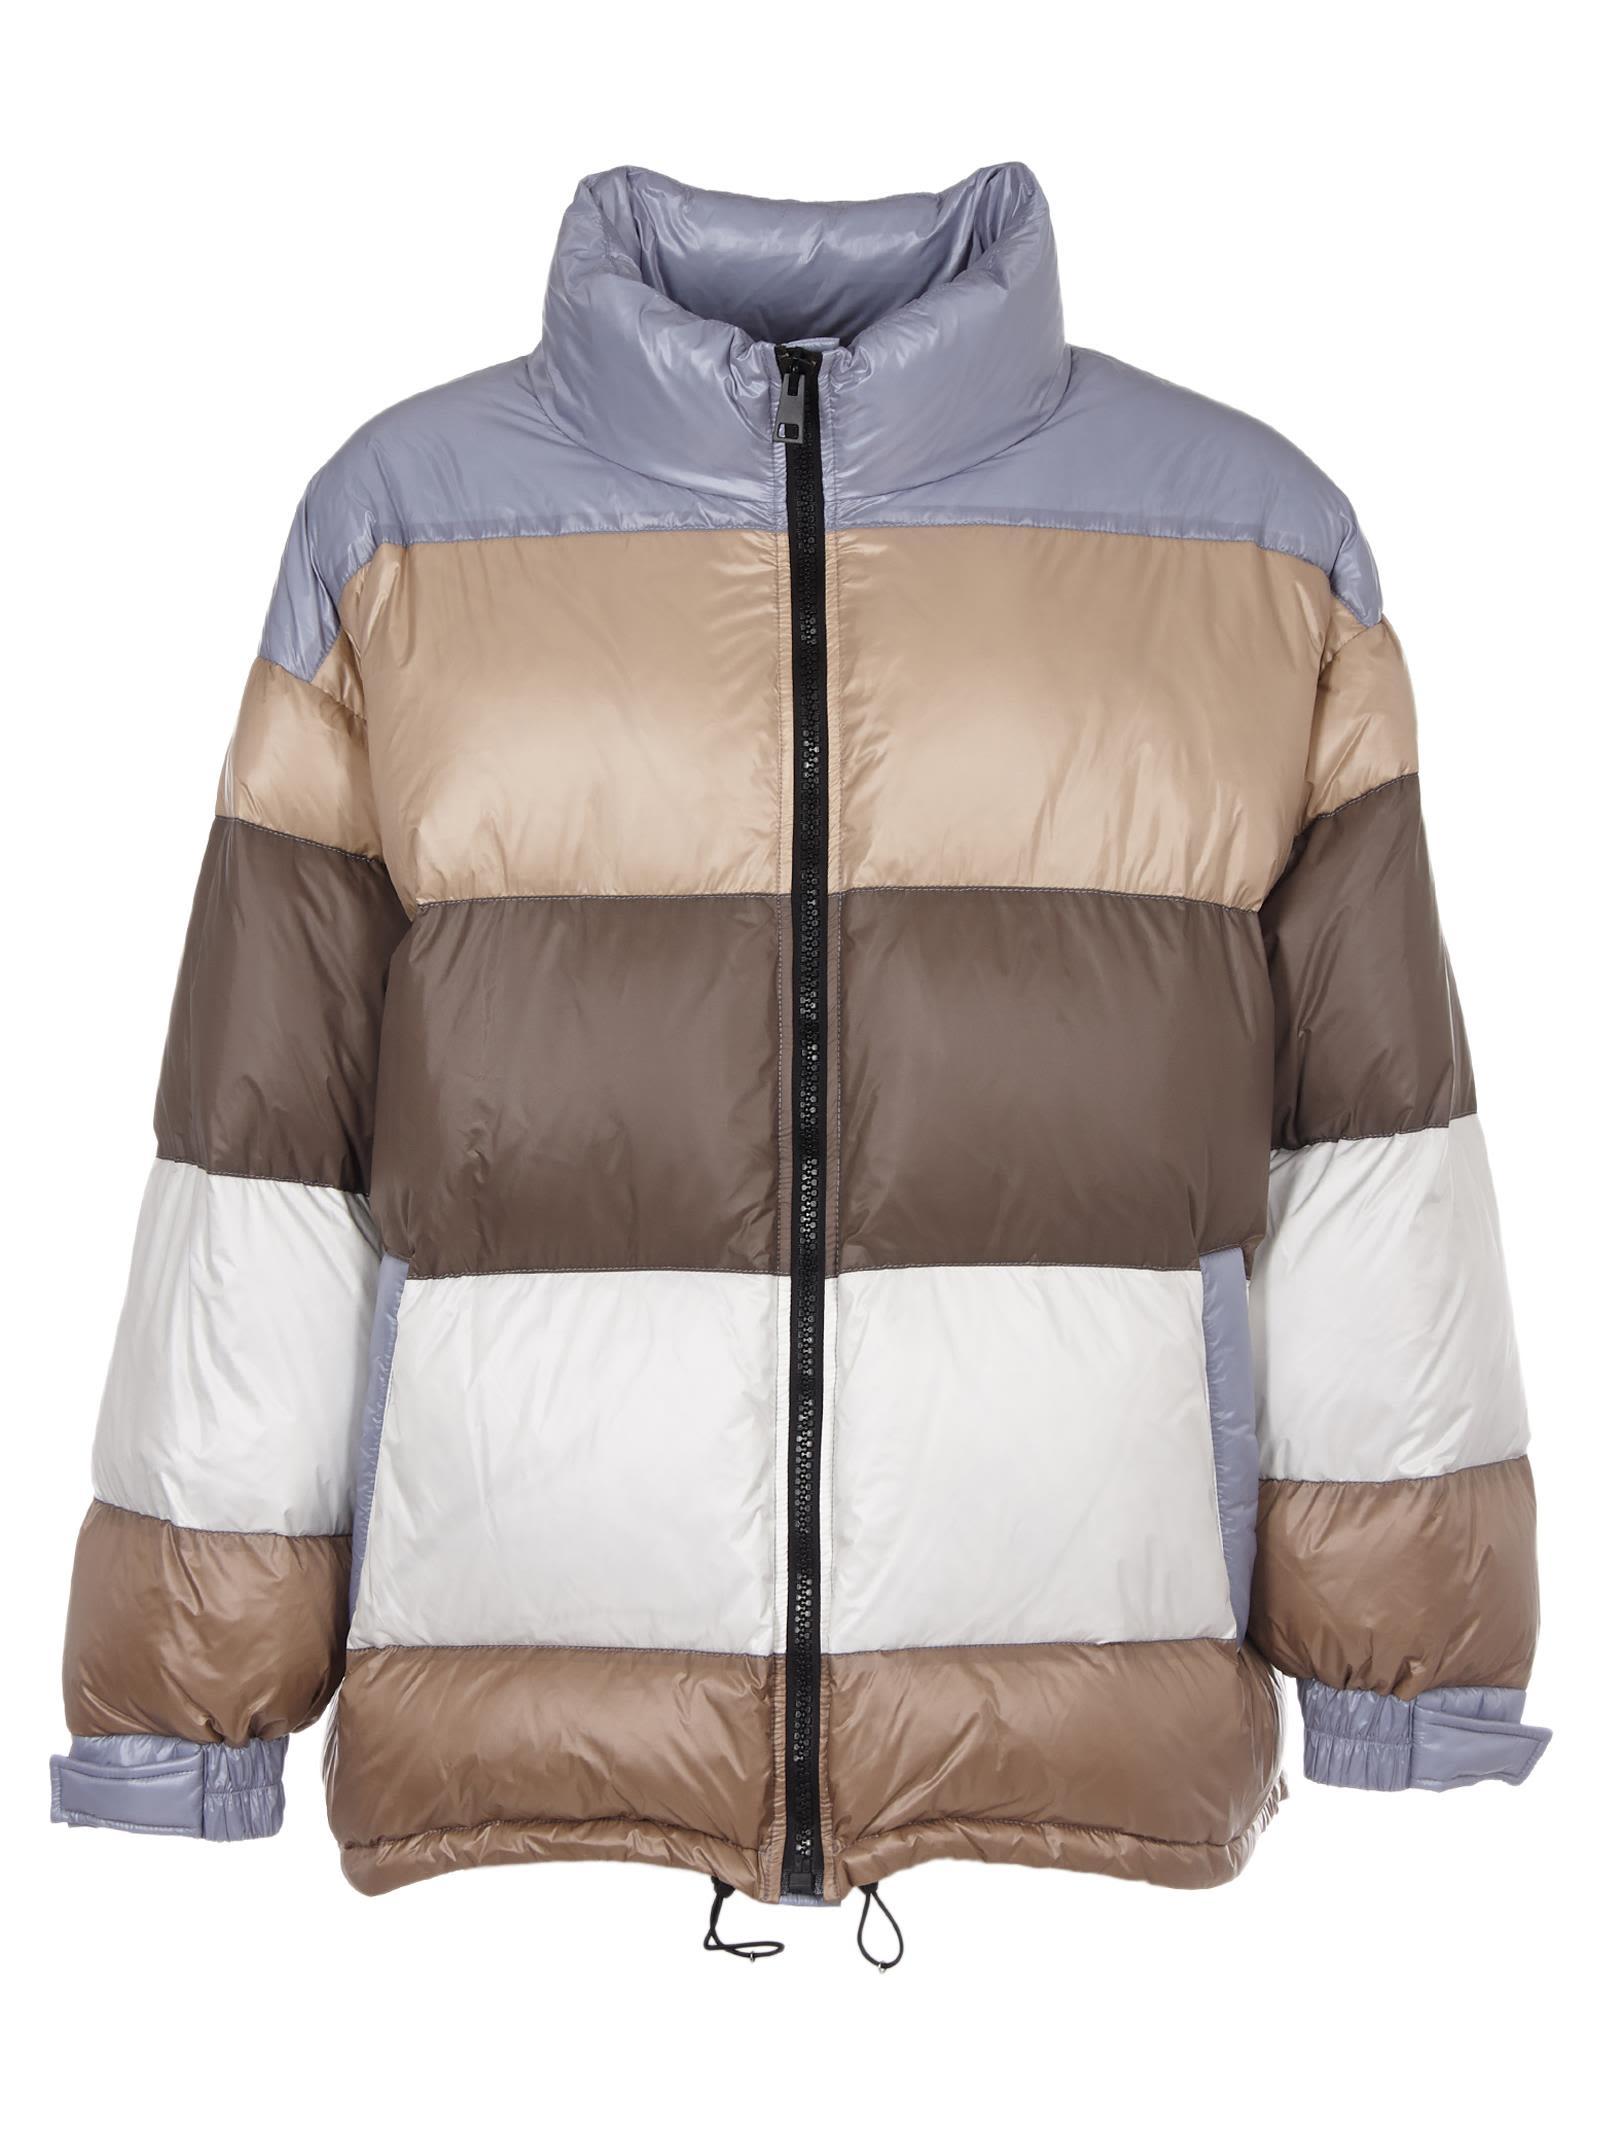 DANILO PAURA Mosca Padded Jacket in Multicolor